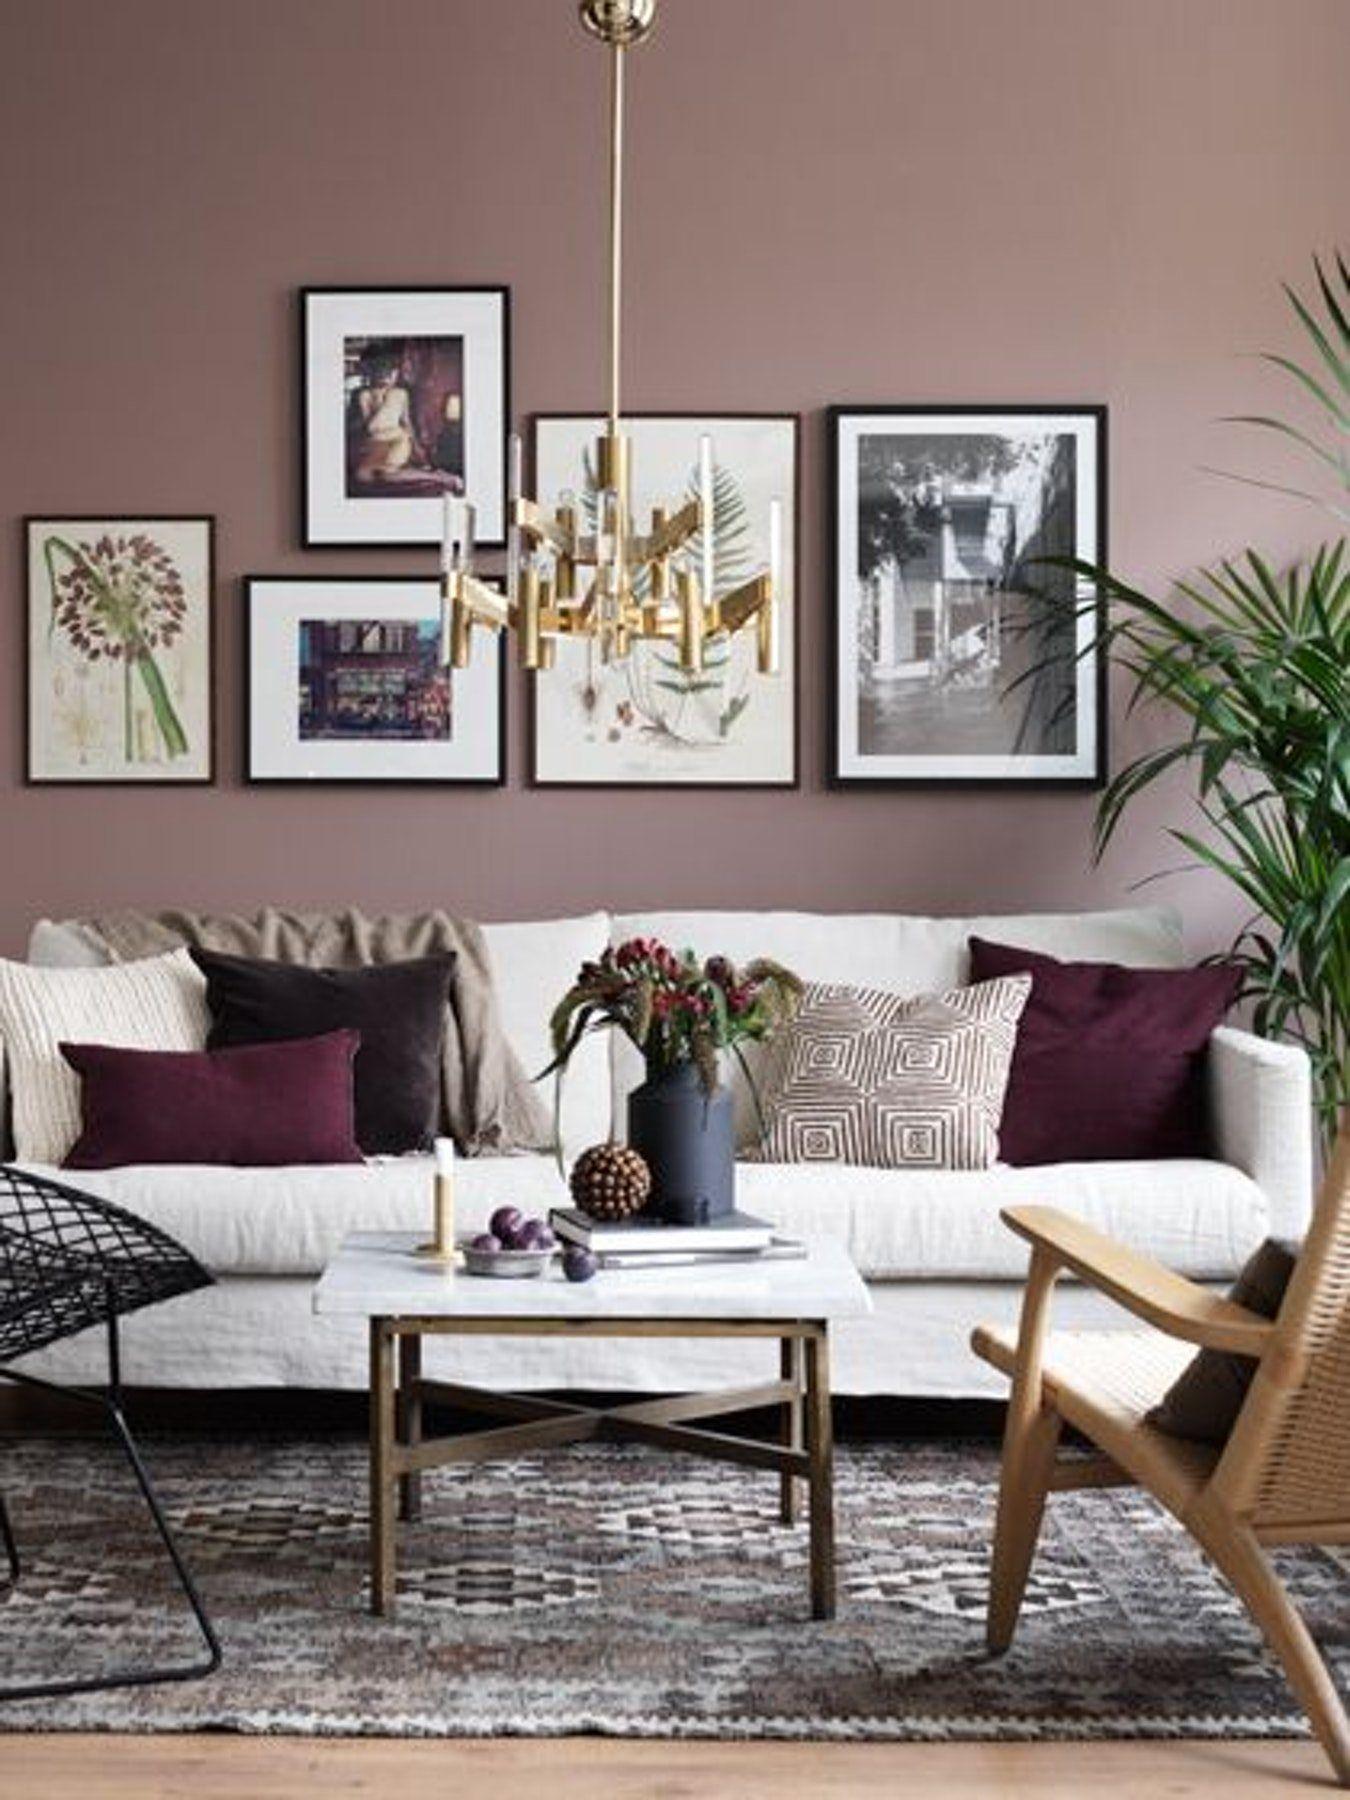 Living Room Color Schemes Burgundy Couch Framed Art Dusty Pink Design Ideas Pinterest Aubergine Decor Graceful